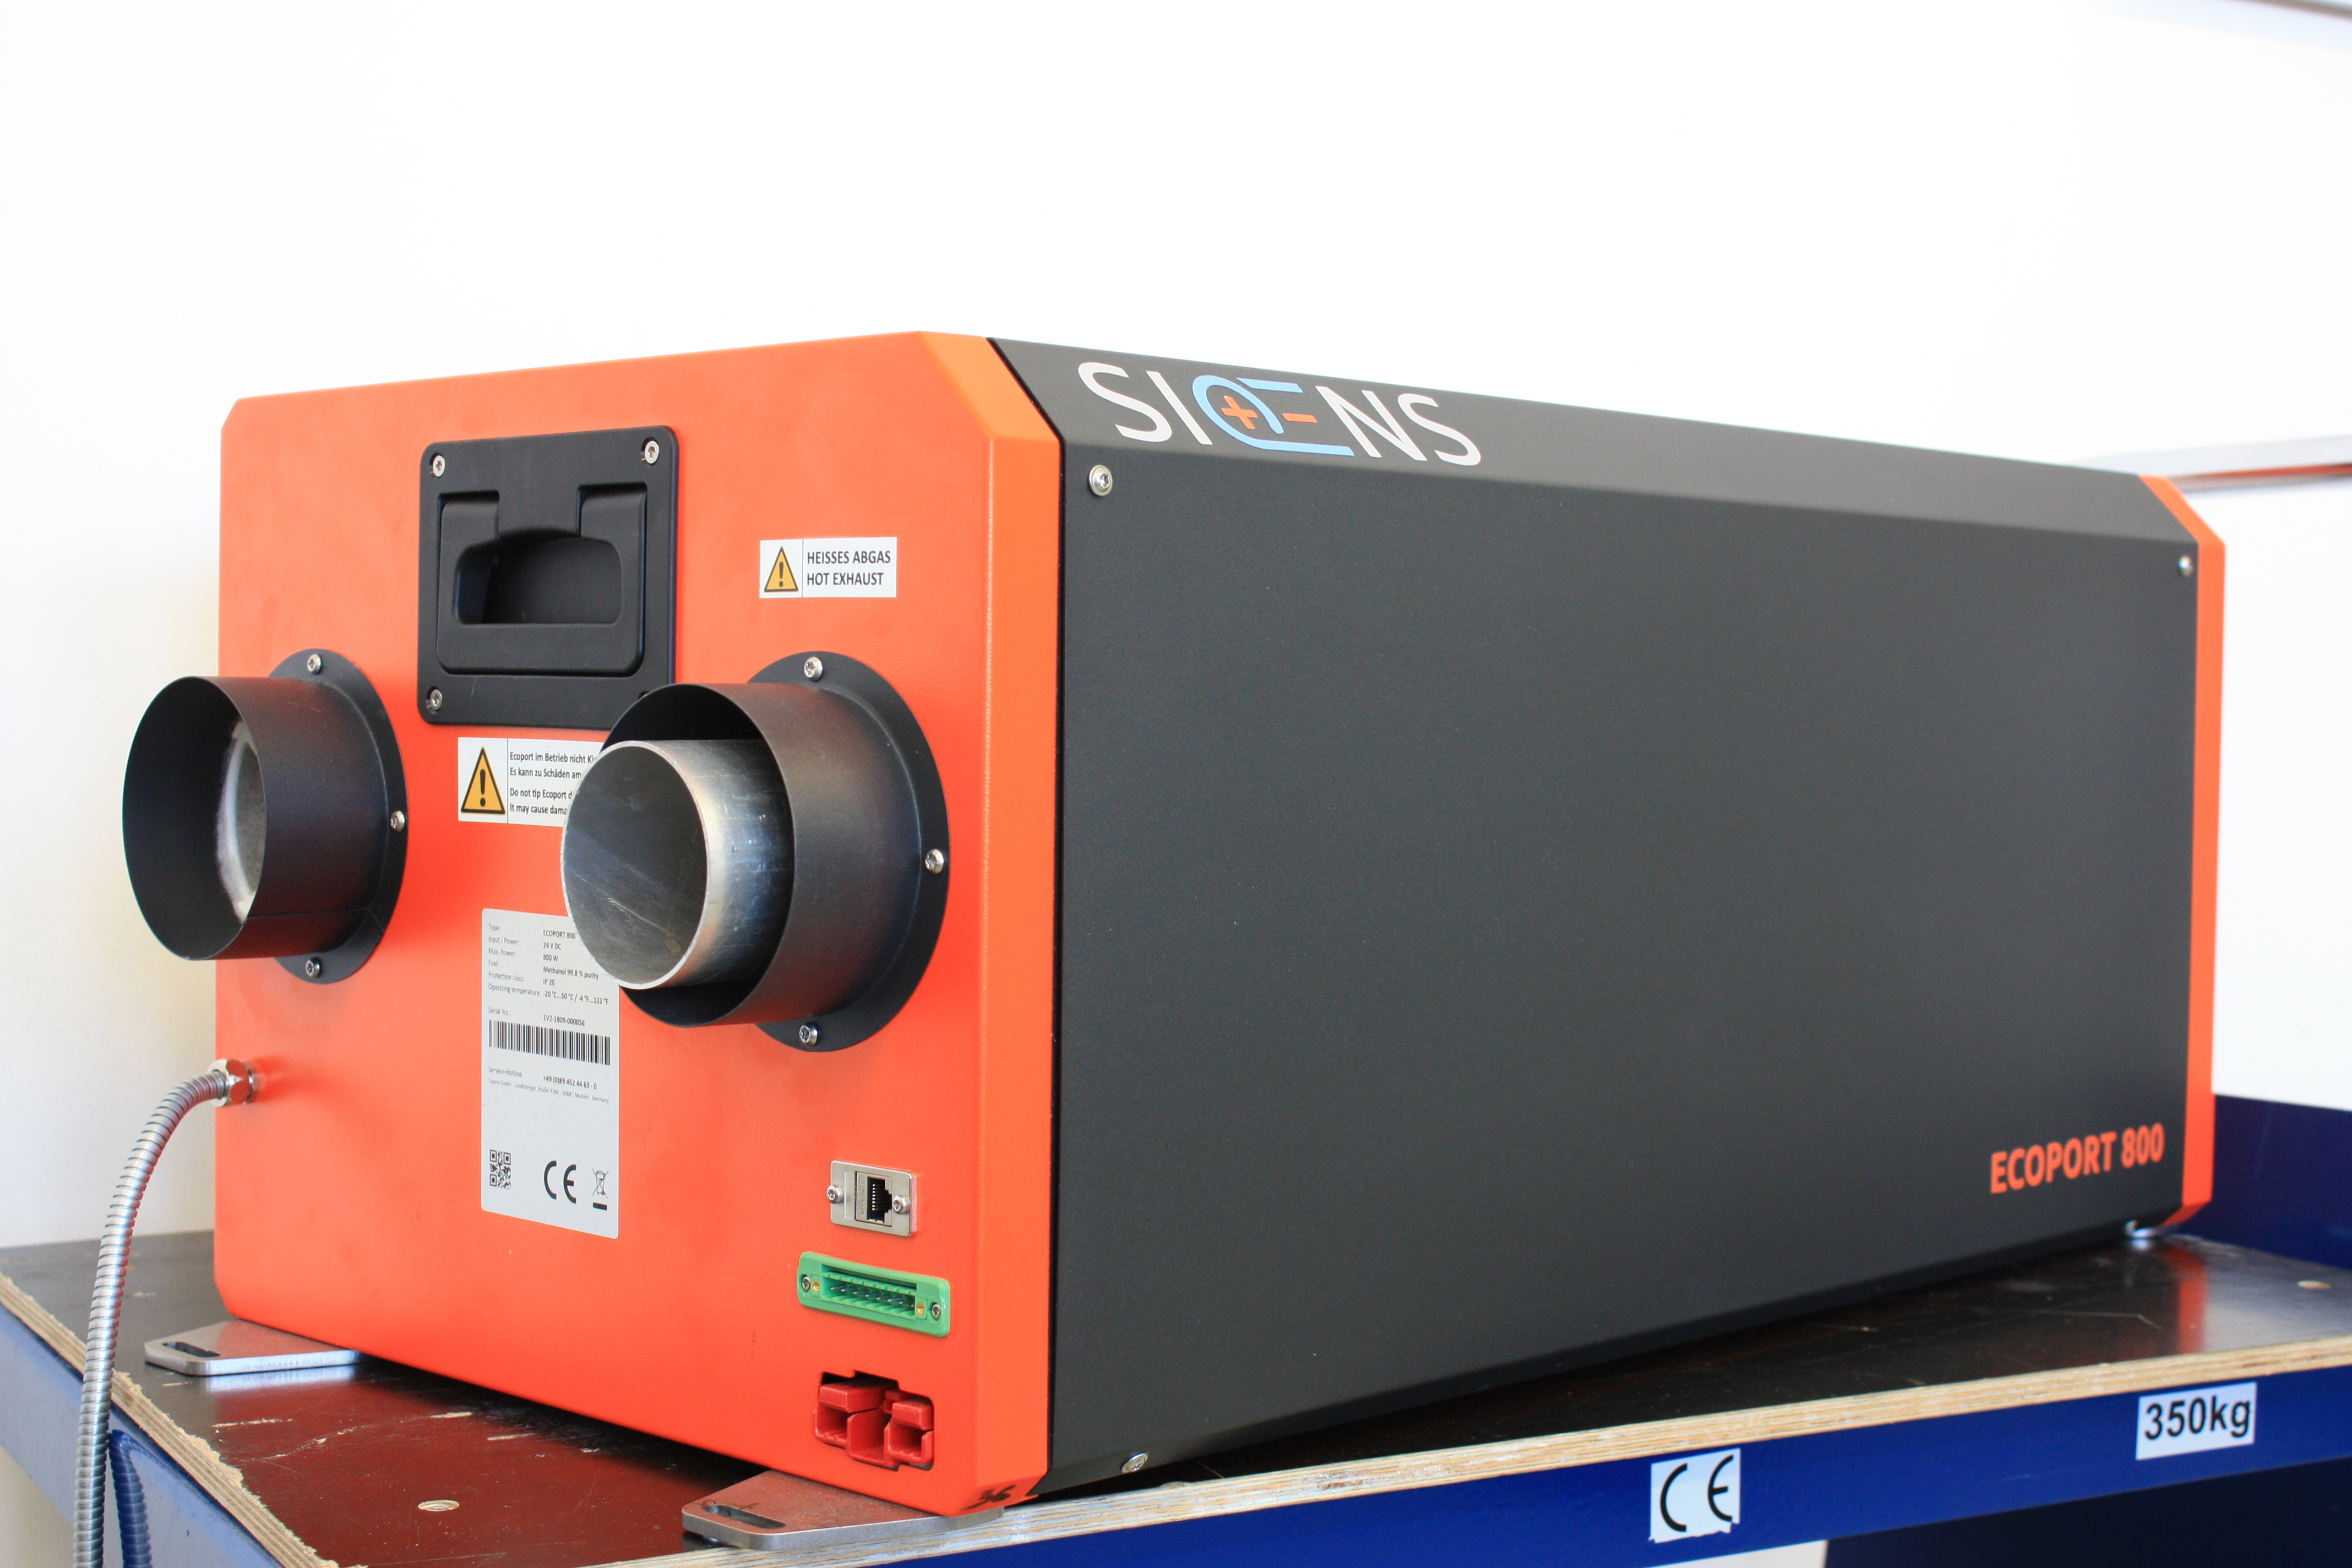 Gallery Ecoport 800 Methanol Fuel Cell 4